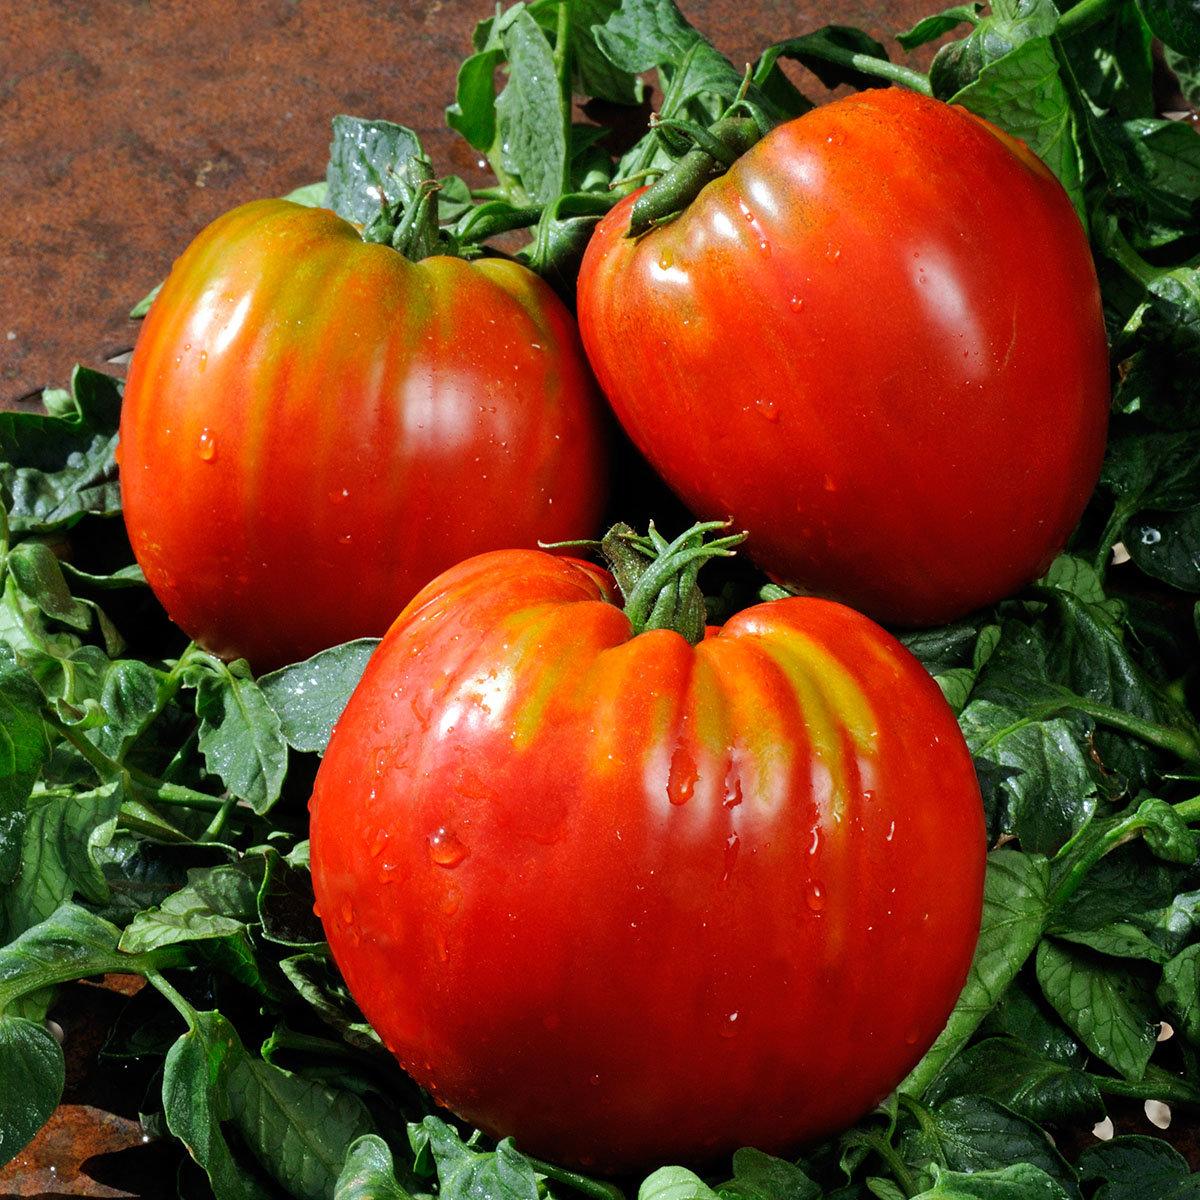 gem se pflanze tomate ochsenherz von g rtner p tschke. Black Bedroom Furniture Sets. Home Design Ideas